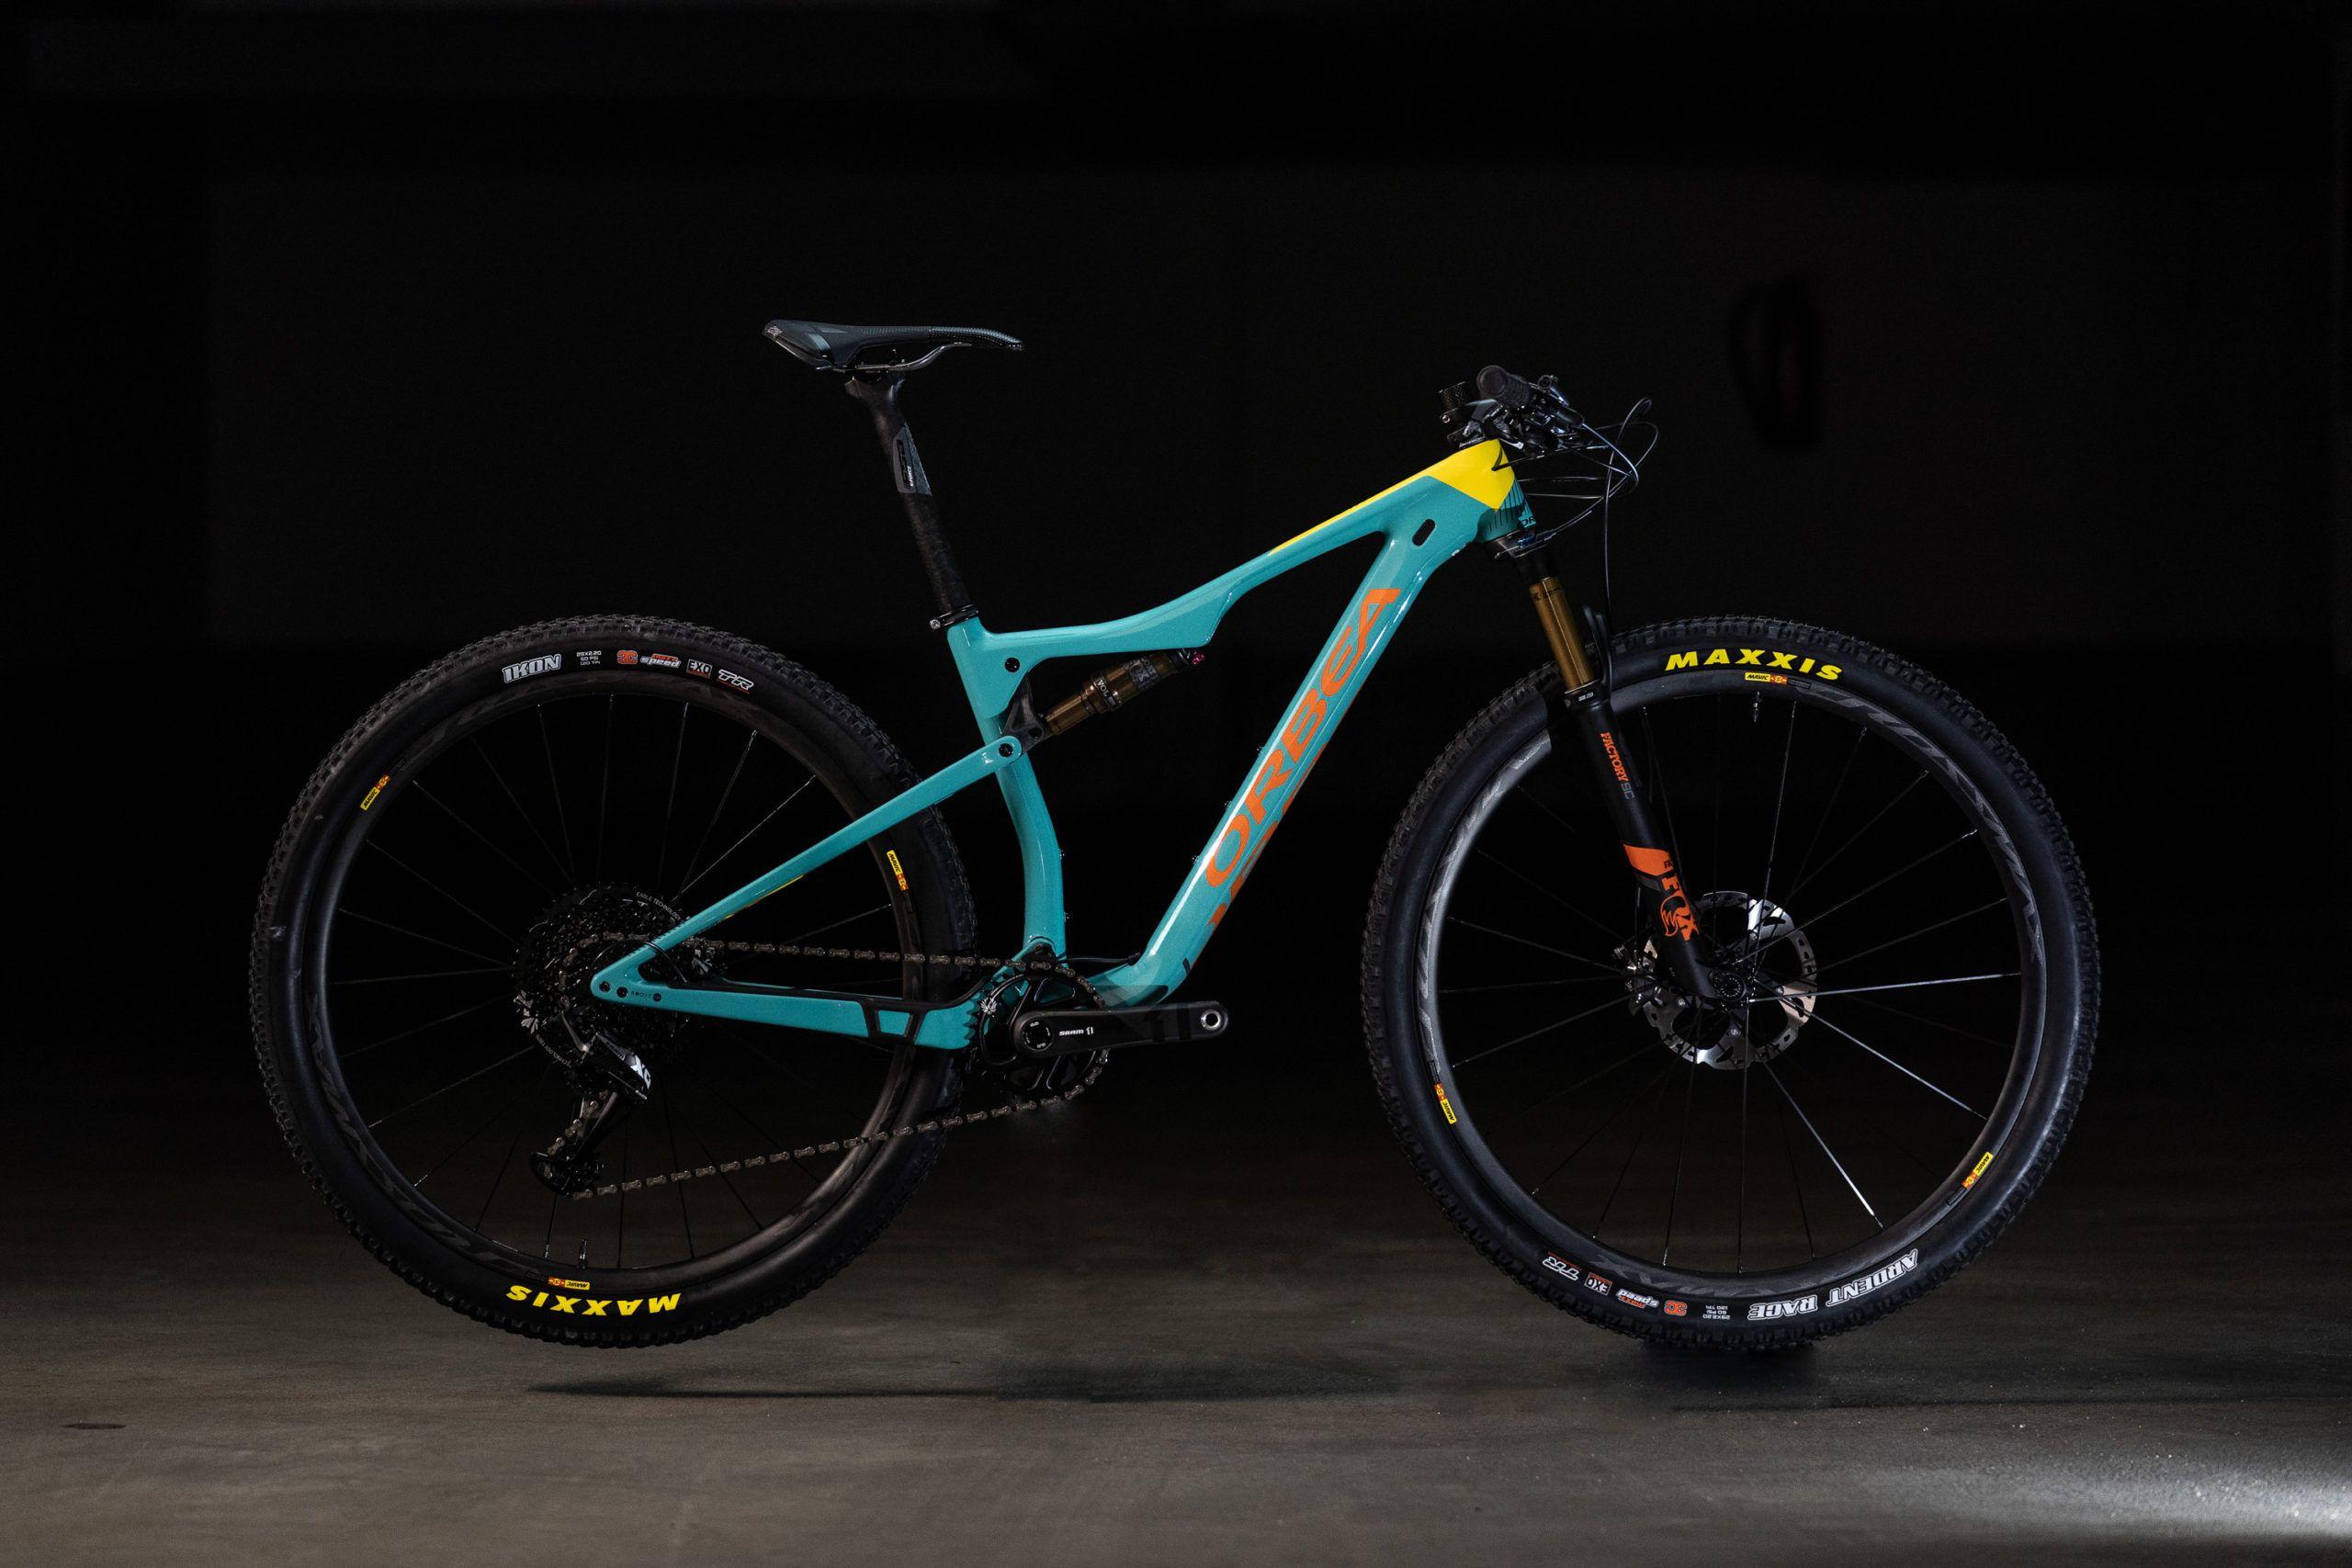 Orbea Oiz M10 Myo Im Test Individuell Schnell Mtb News De In 2020 Mountain Biking Mtb Fahrwerk